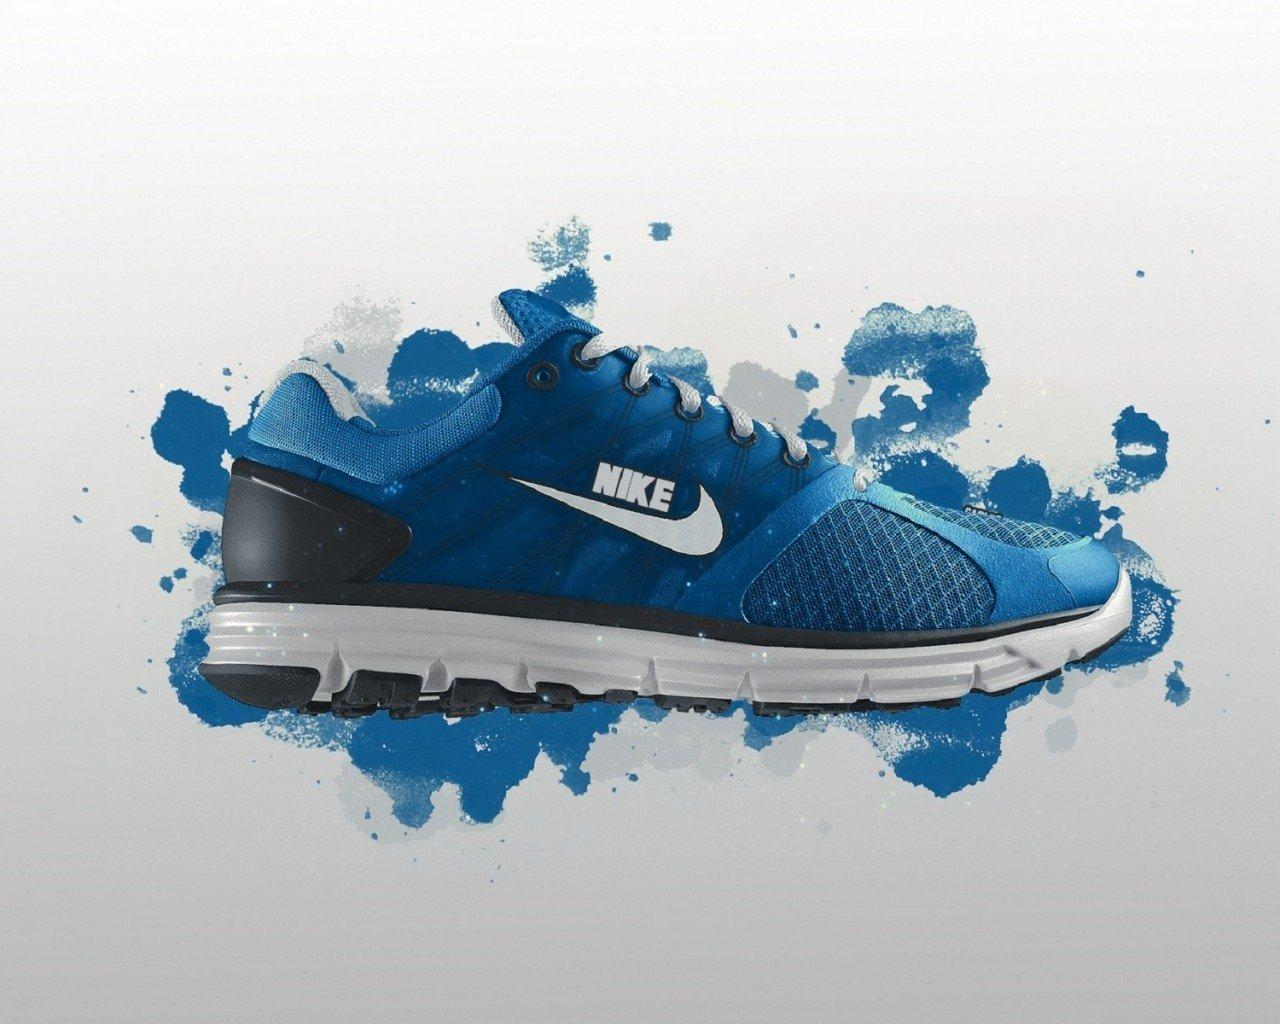 Nike Shoes Wallpaper wallpaper wallpaper hd background desktop 1280x1024